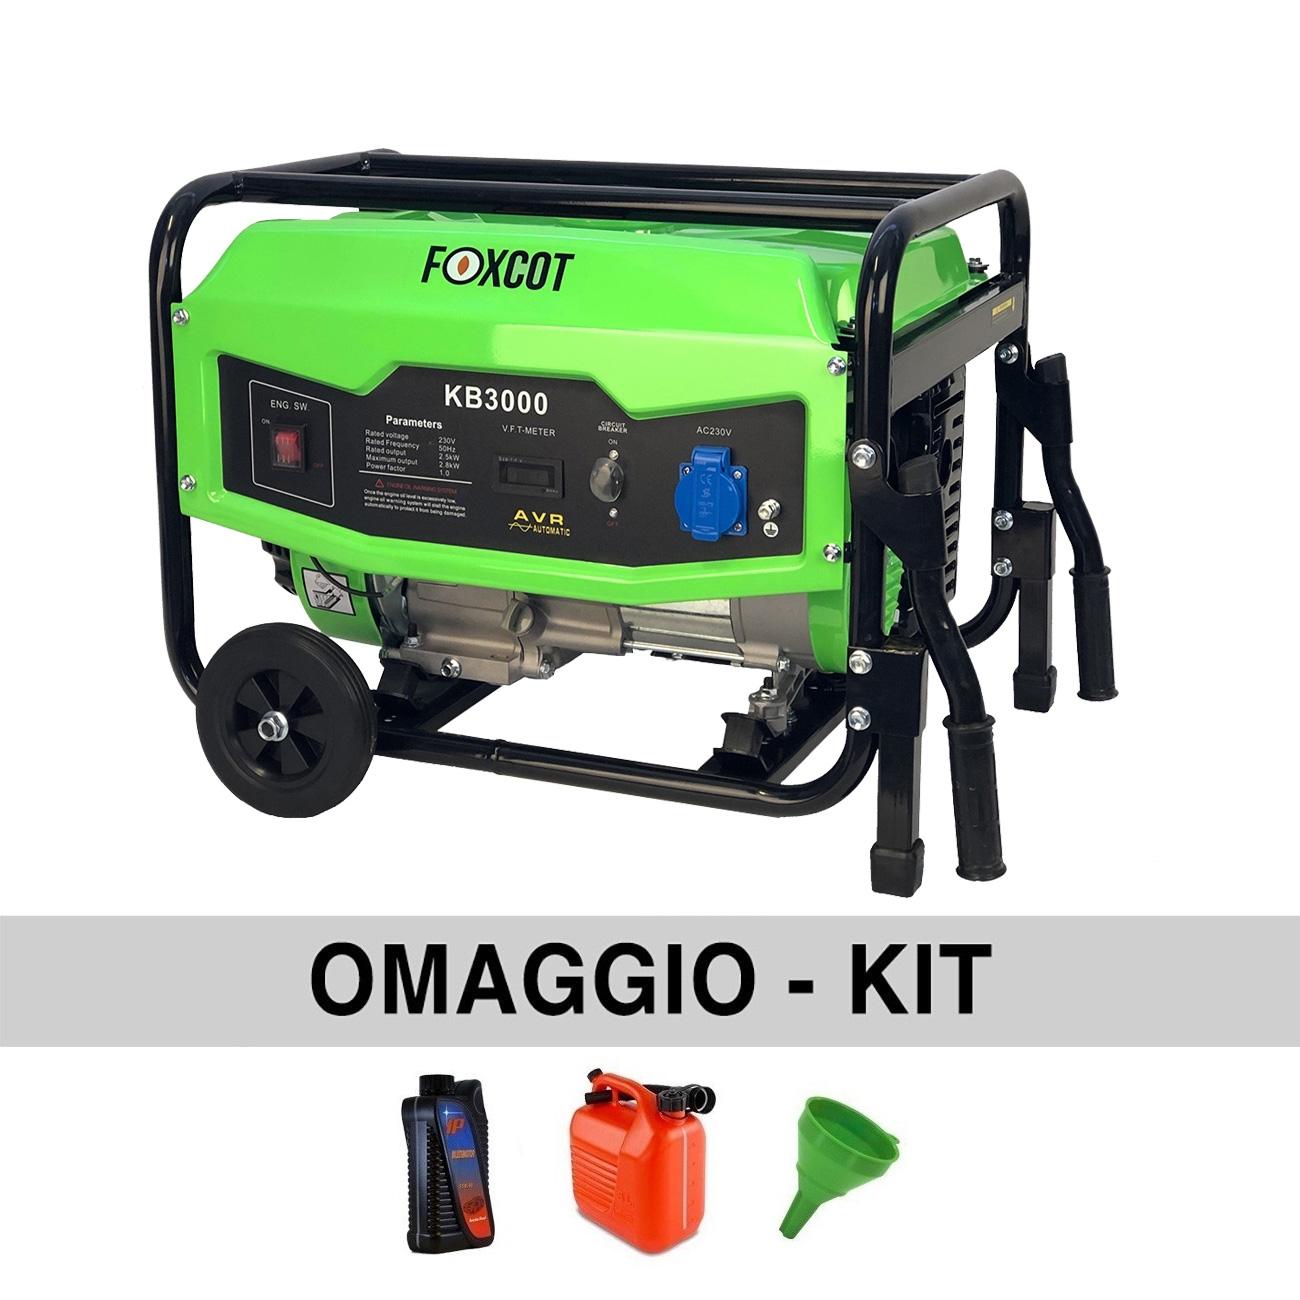 Image of Generatore di corrente 2,8 Kw Foxcot KB3000